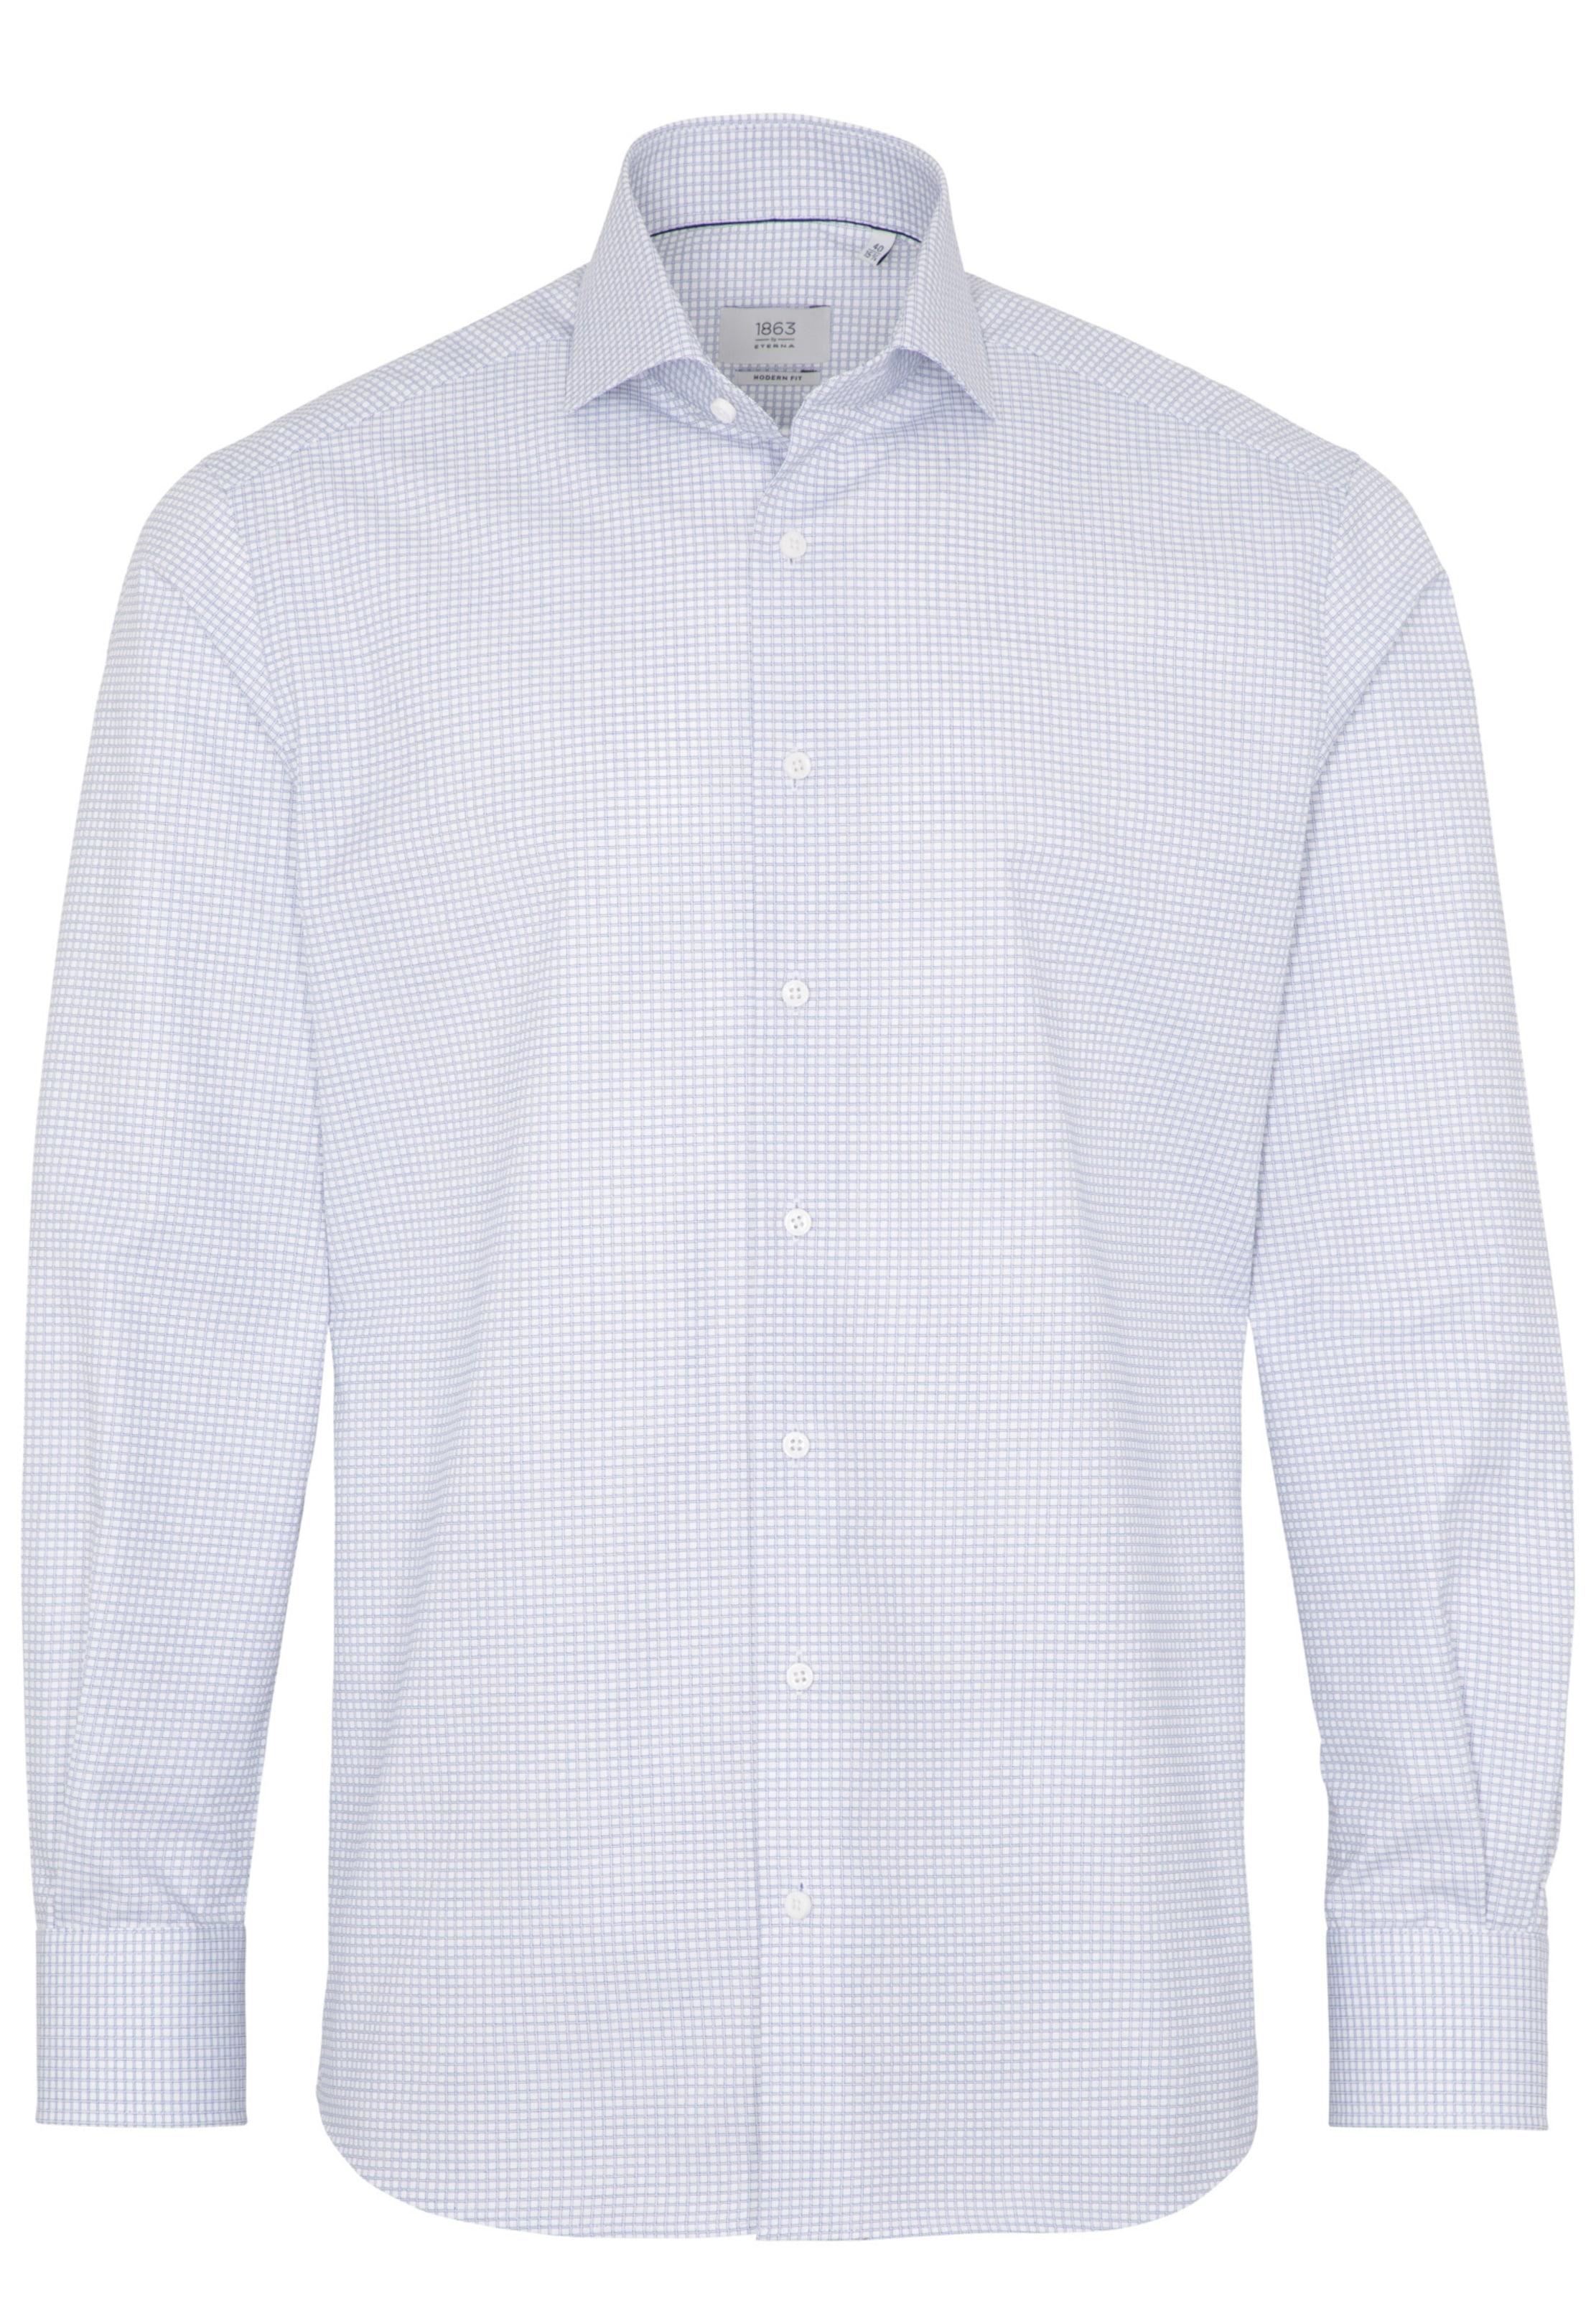 BlauWeiß Eterna In Hemd Hemd Eterna jUpLzGSVqM